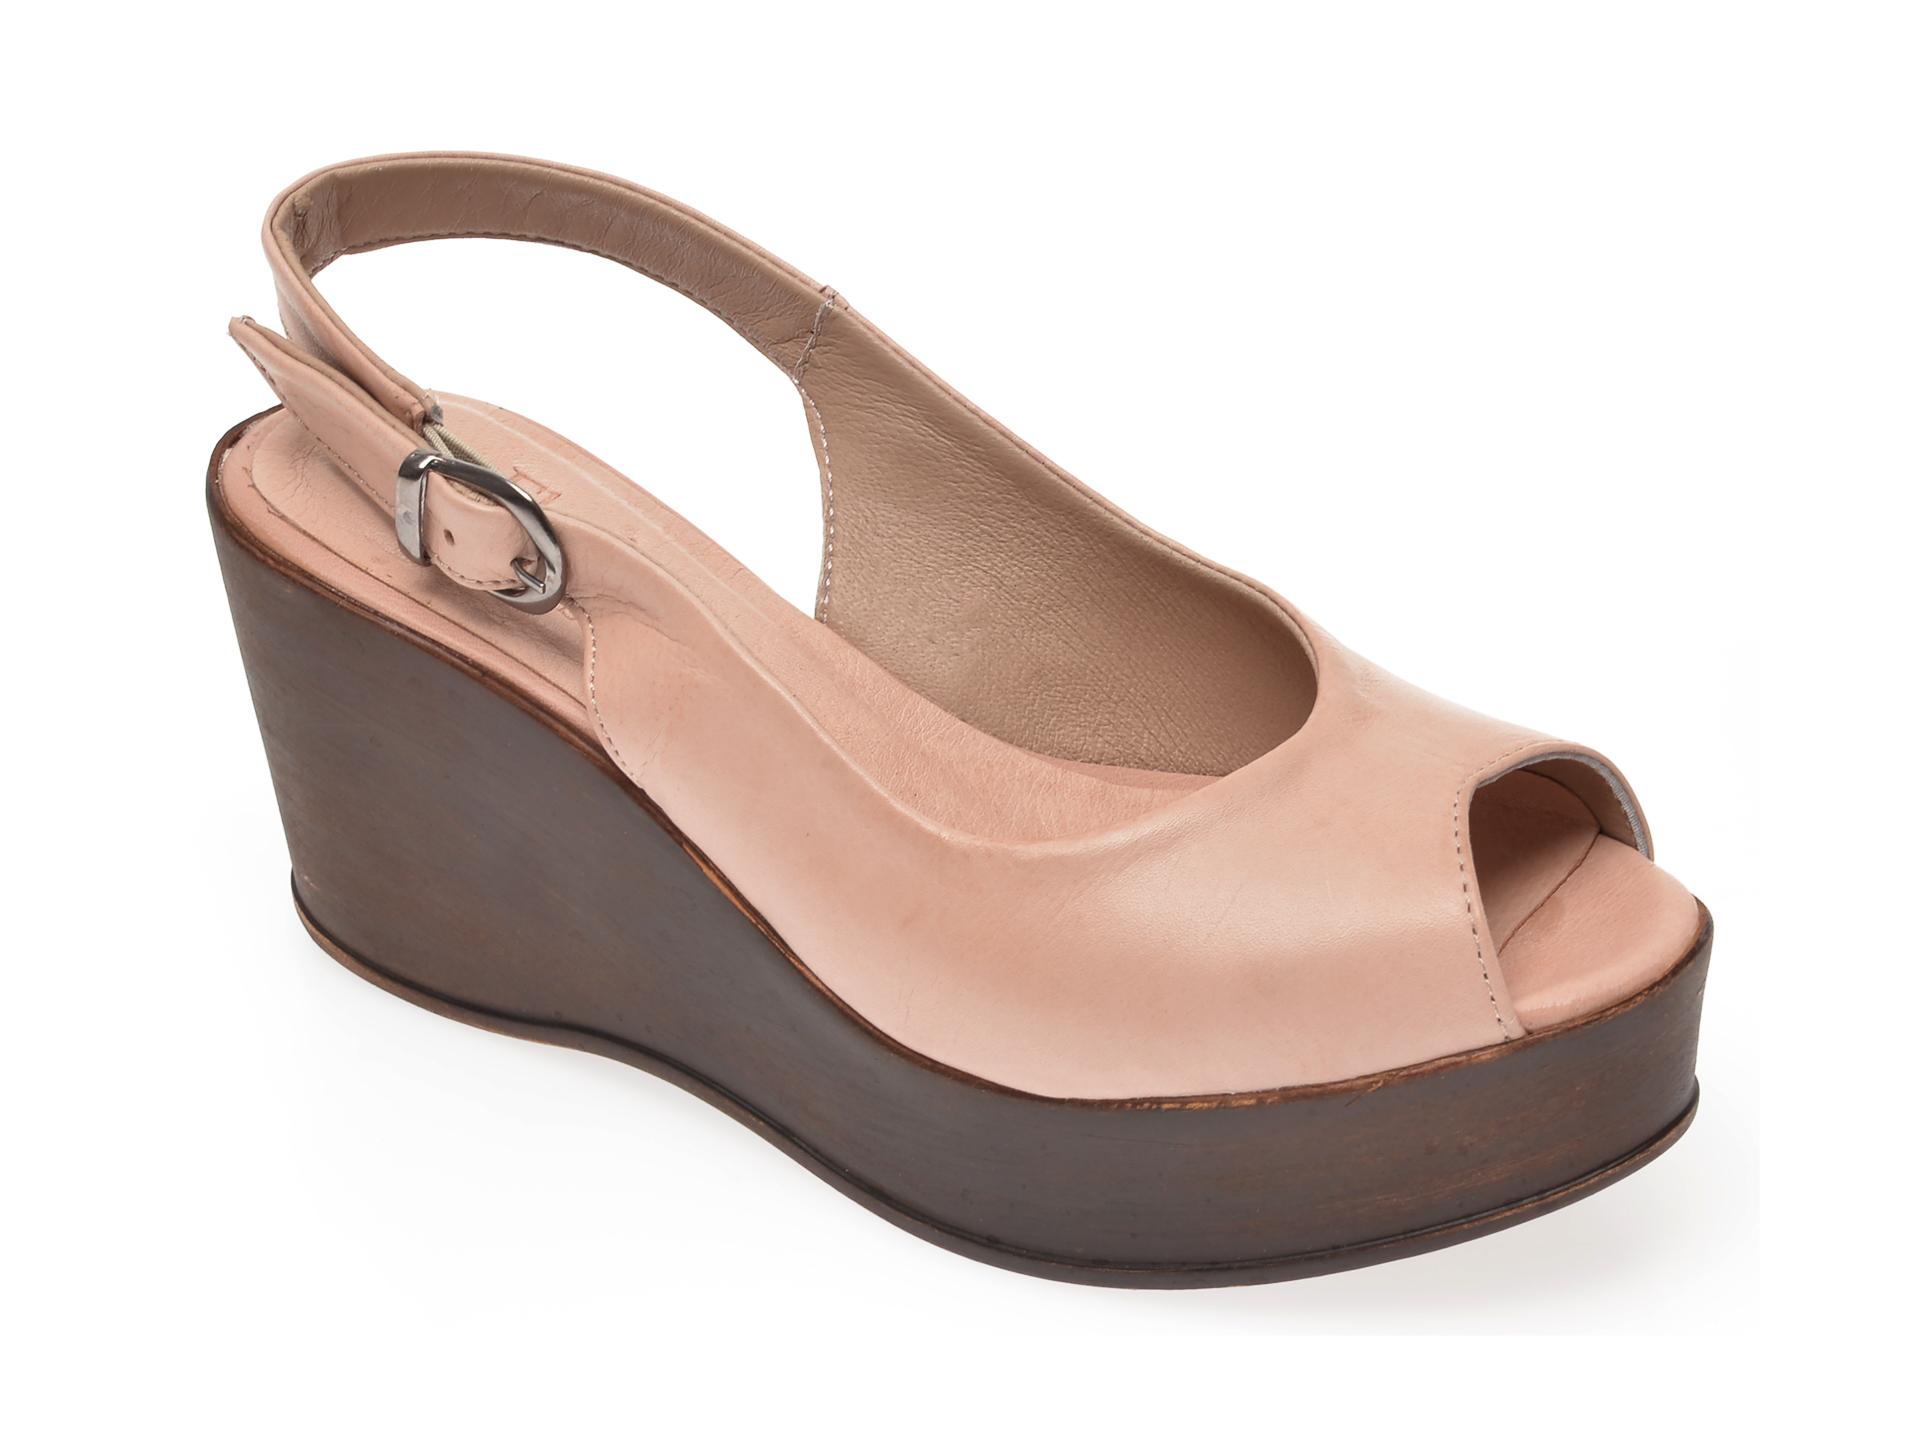 Sandale FLAVIA PASSINI roz, 1110, din piele naturala